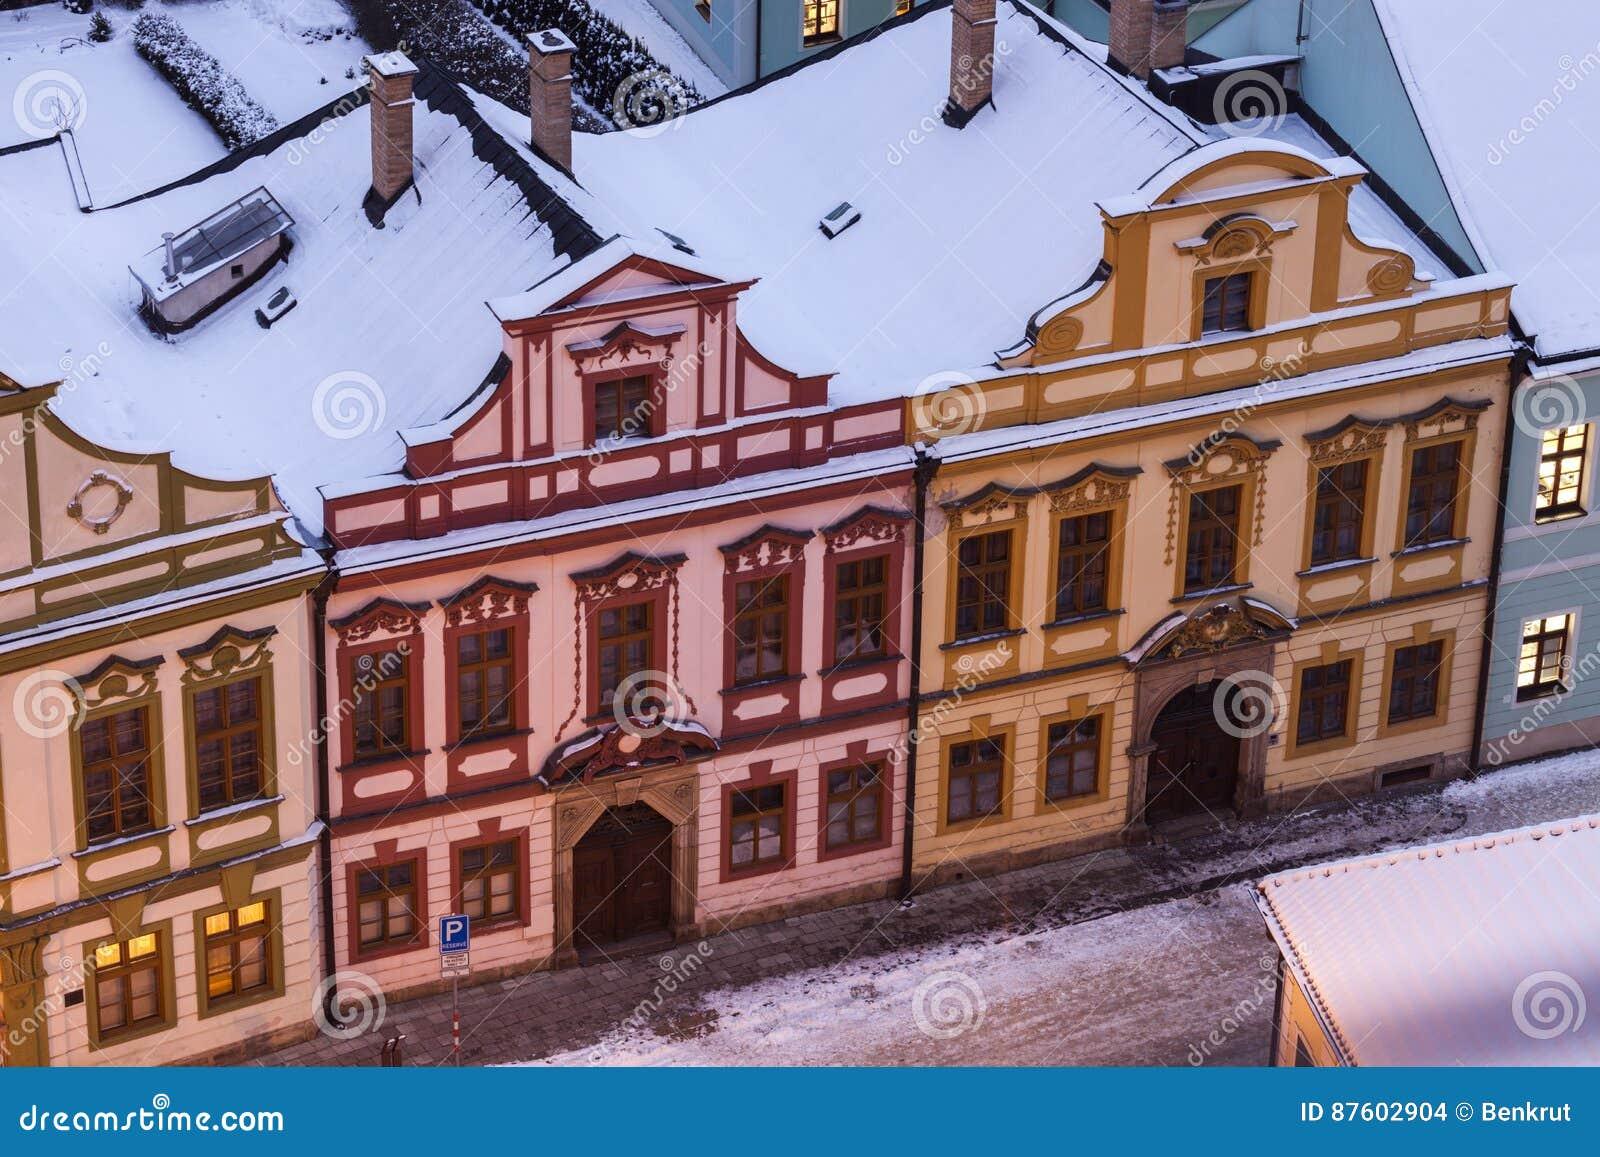 Colorful architecture of Main Square in Hradec Kralove